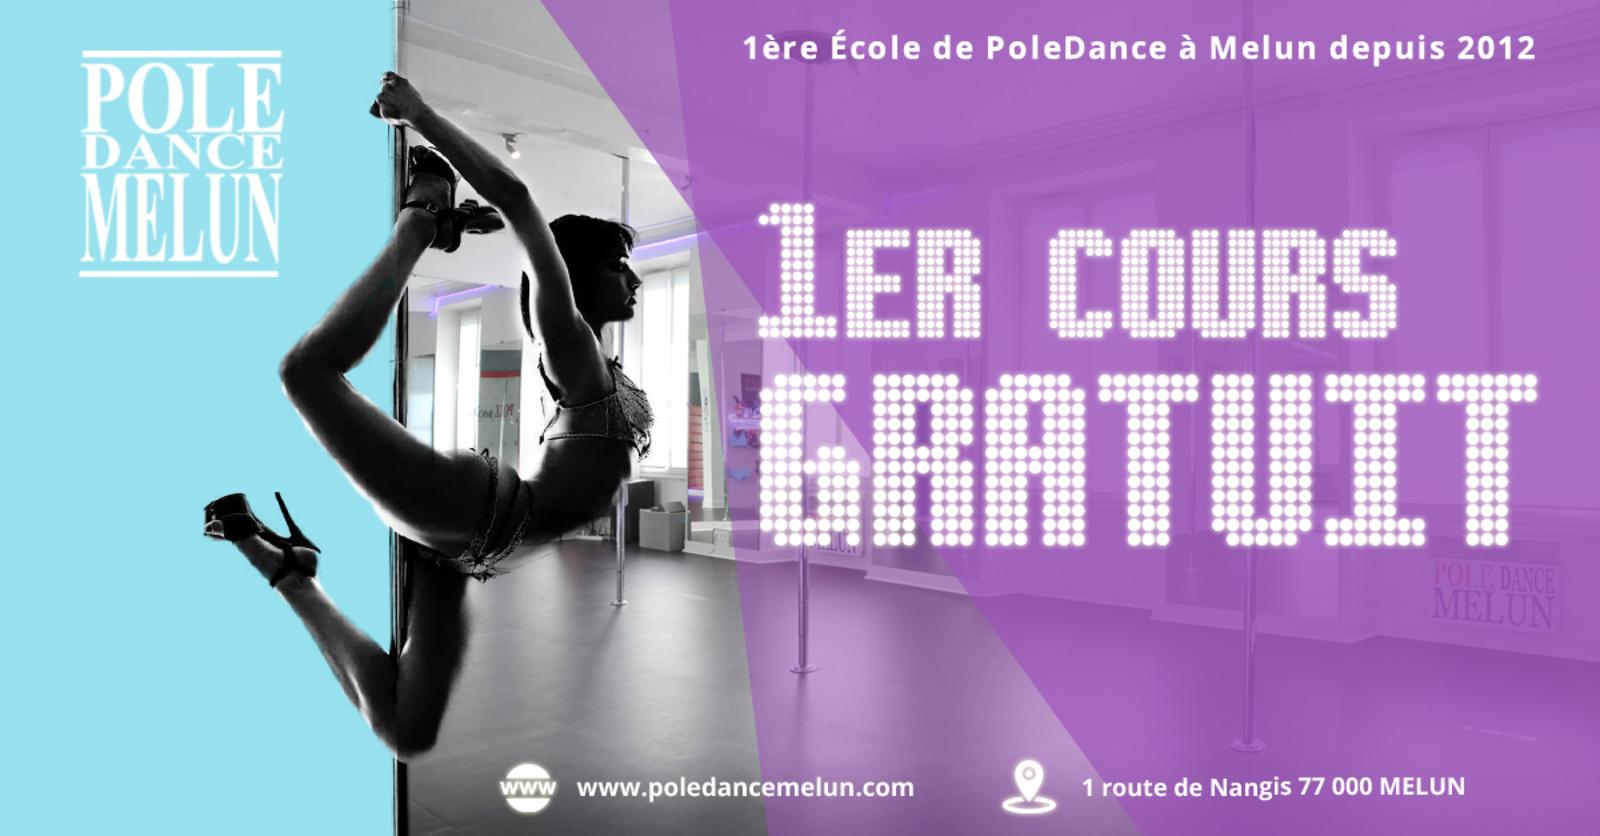 Cours PoleDance - Pole Dance Melun Depuis 2012